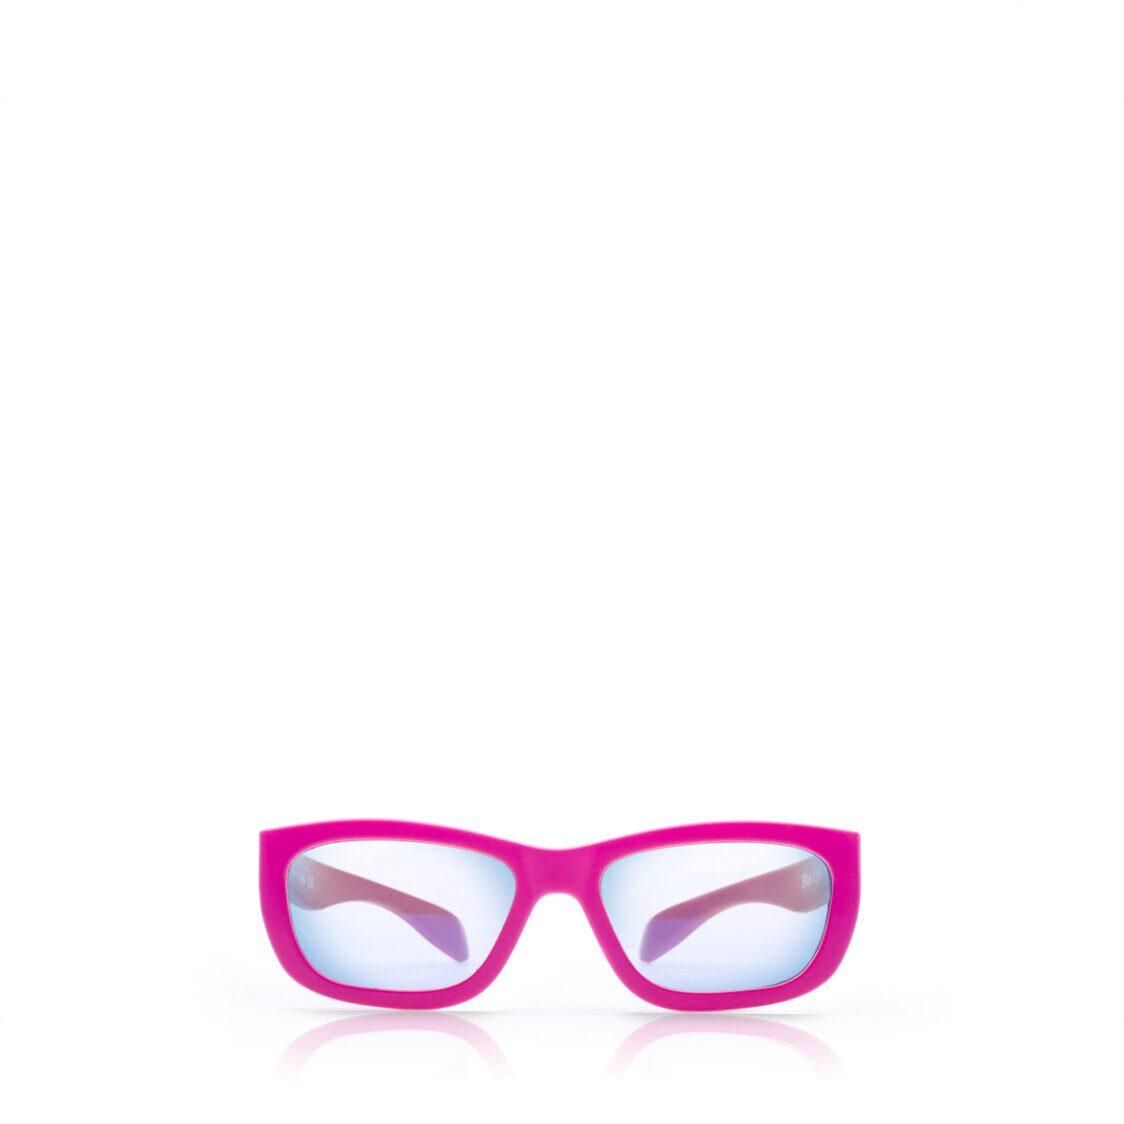 Shadez Eyewear Blue Light Pink Teeny aged 7- 16 years old